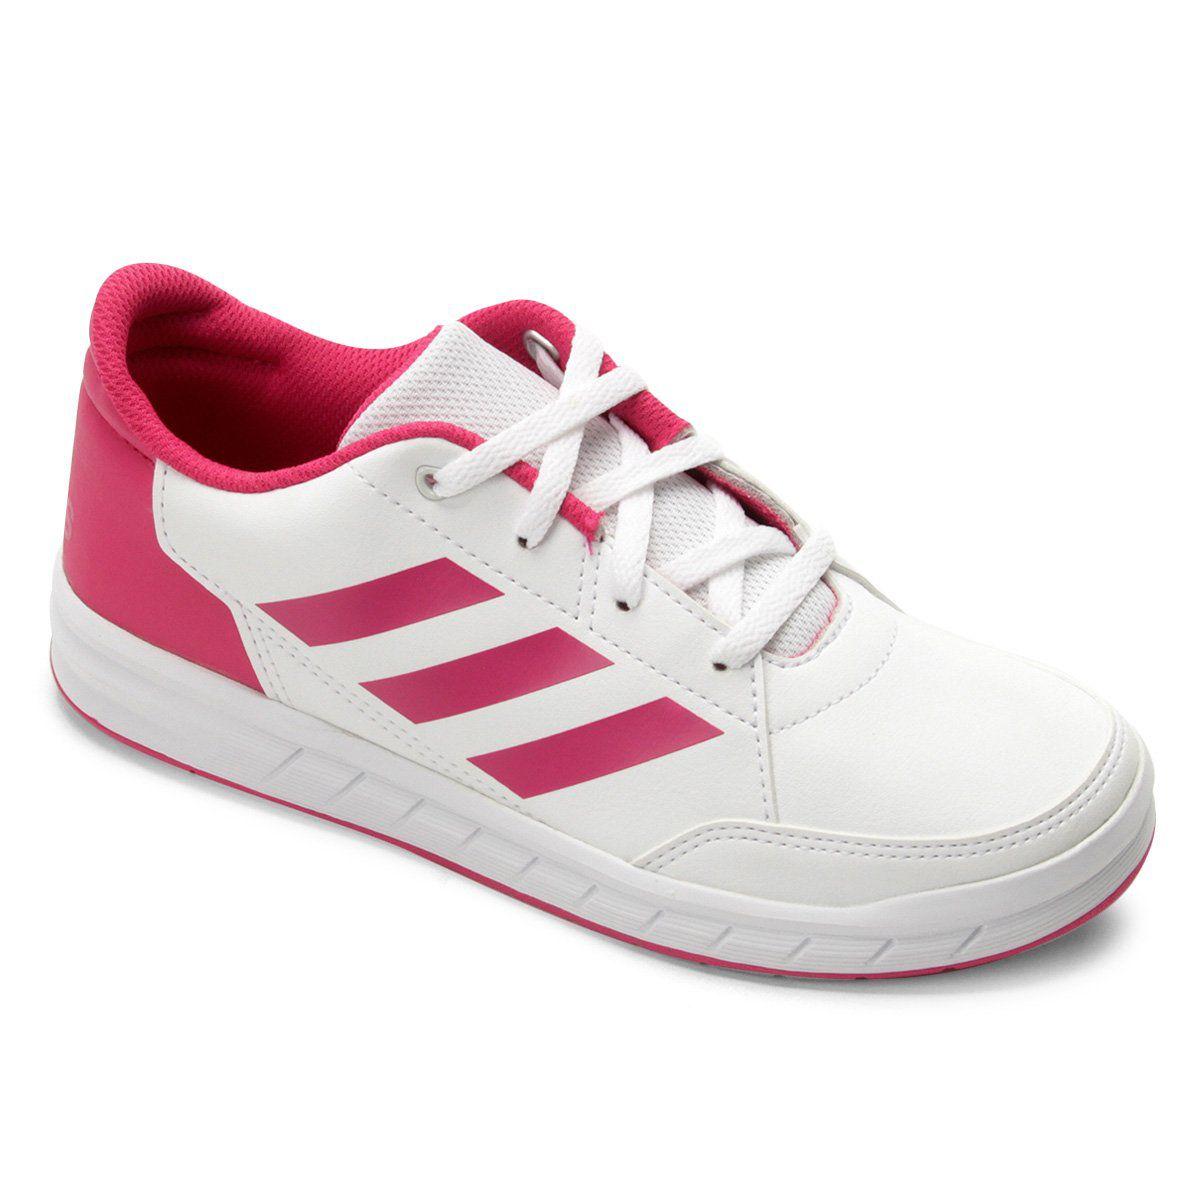 Tênis Infantil Adidas AltaSport Feminino